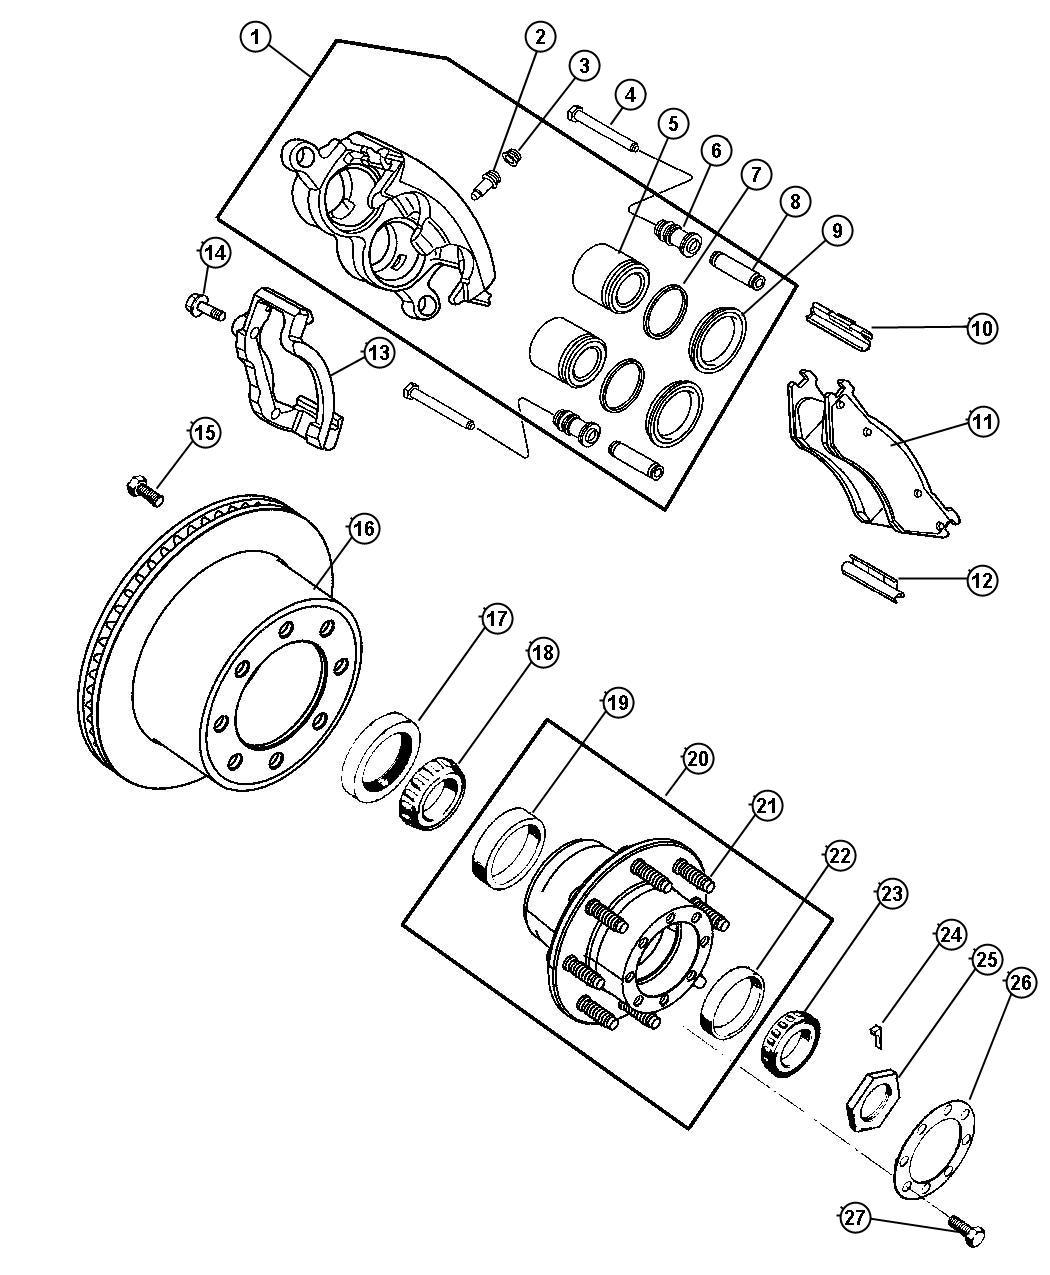 dodge ram 2500 ke caliper parts diagram  dodge  auto